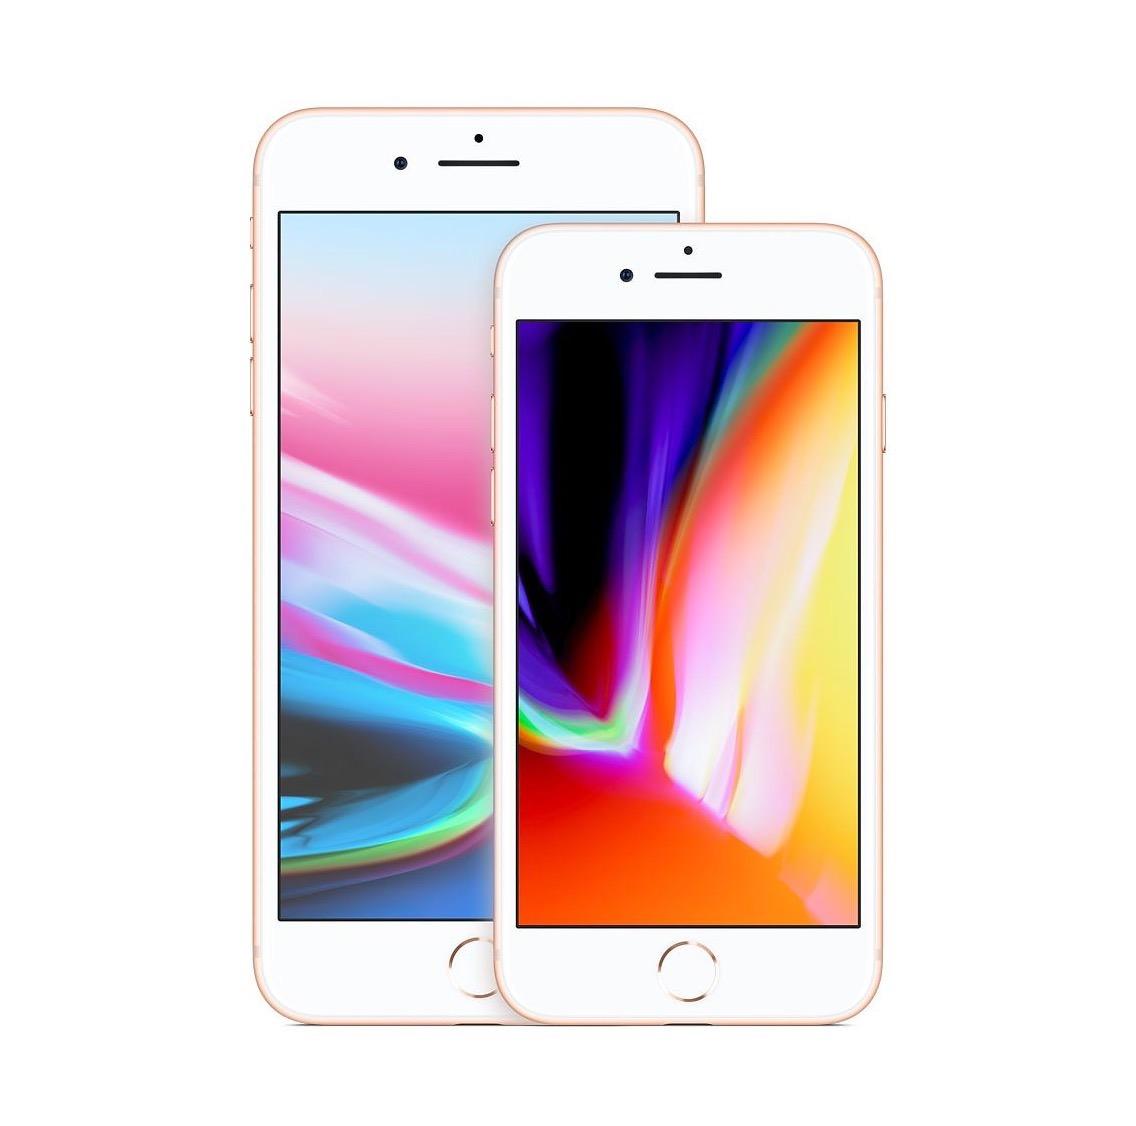 「iPhone SE2」デザインはiPhone 8で価格は399ドルから